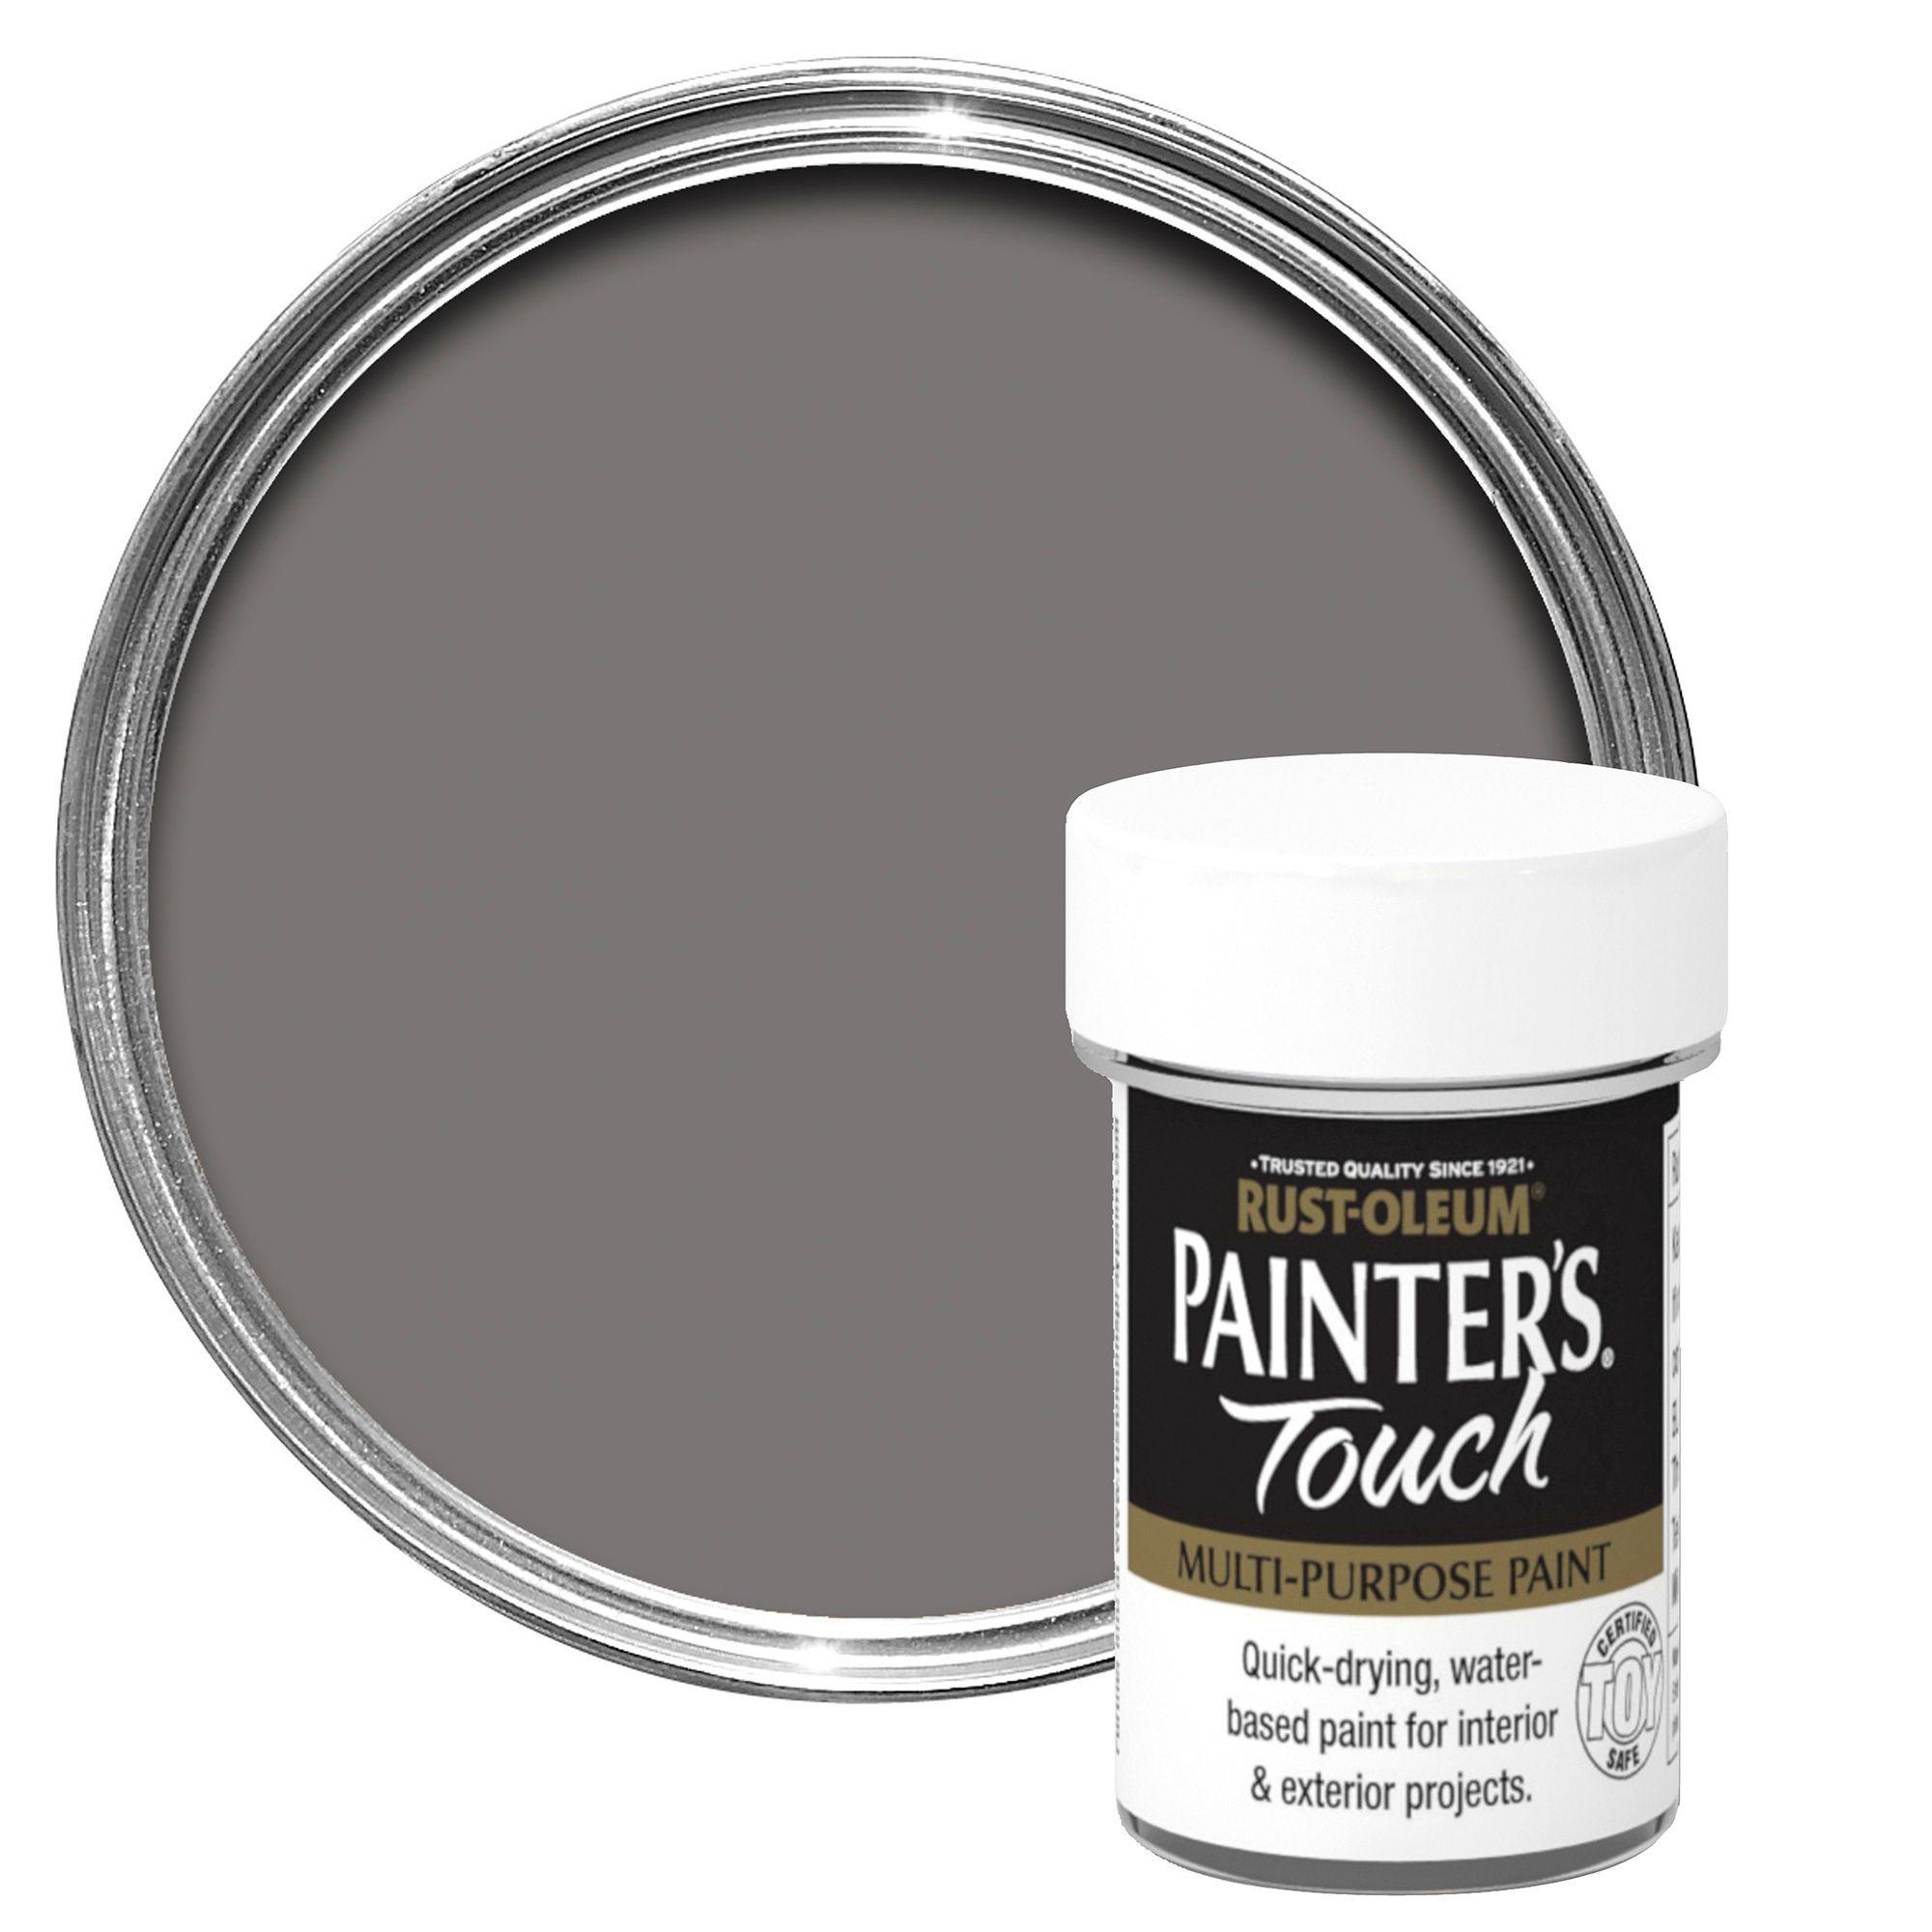 Dark Grey Paint rust-oleum painter's touch interior & exterior dark grey gloss